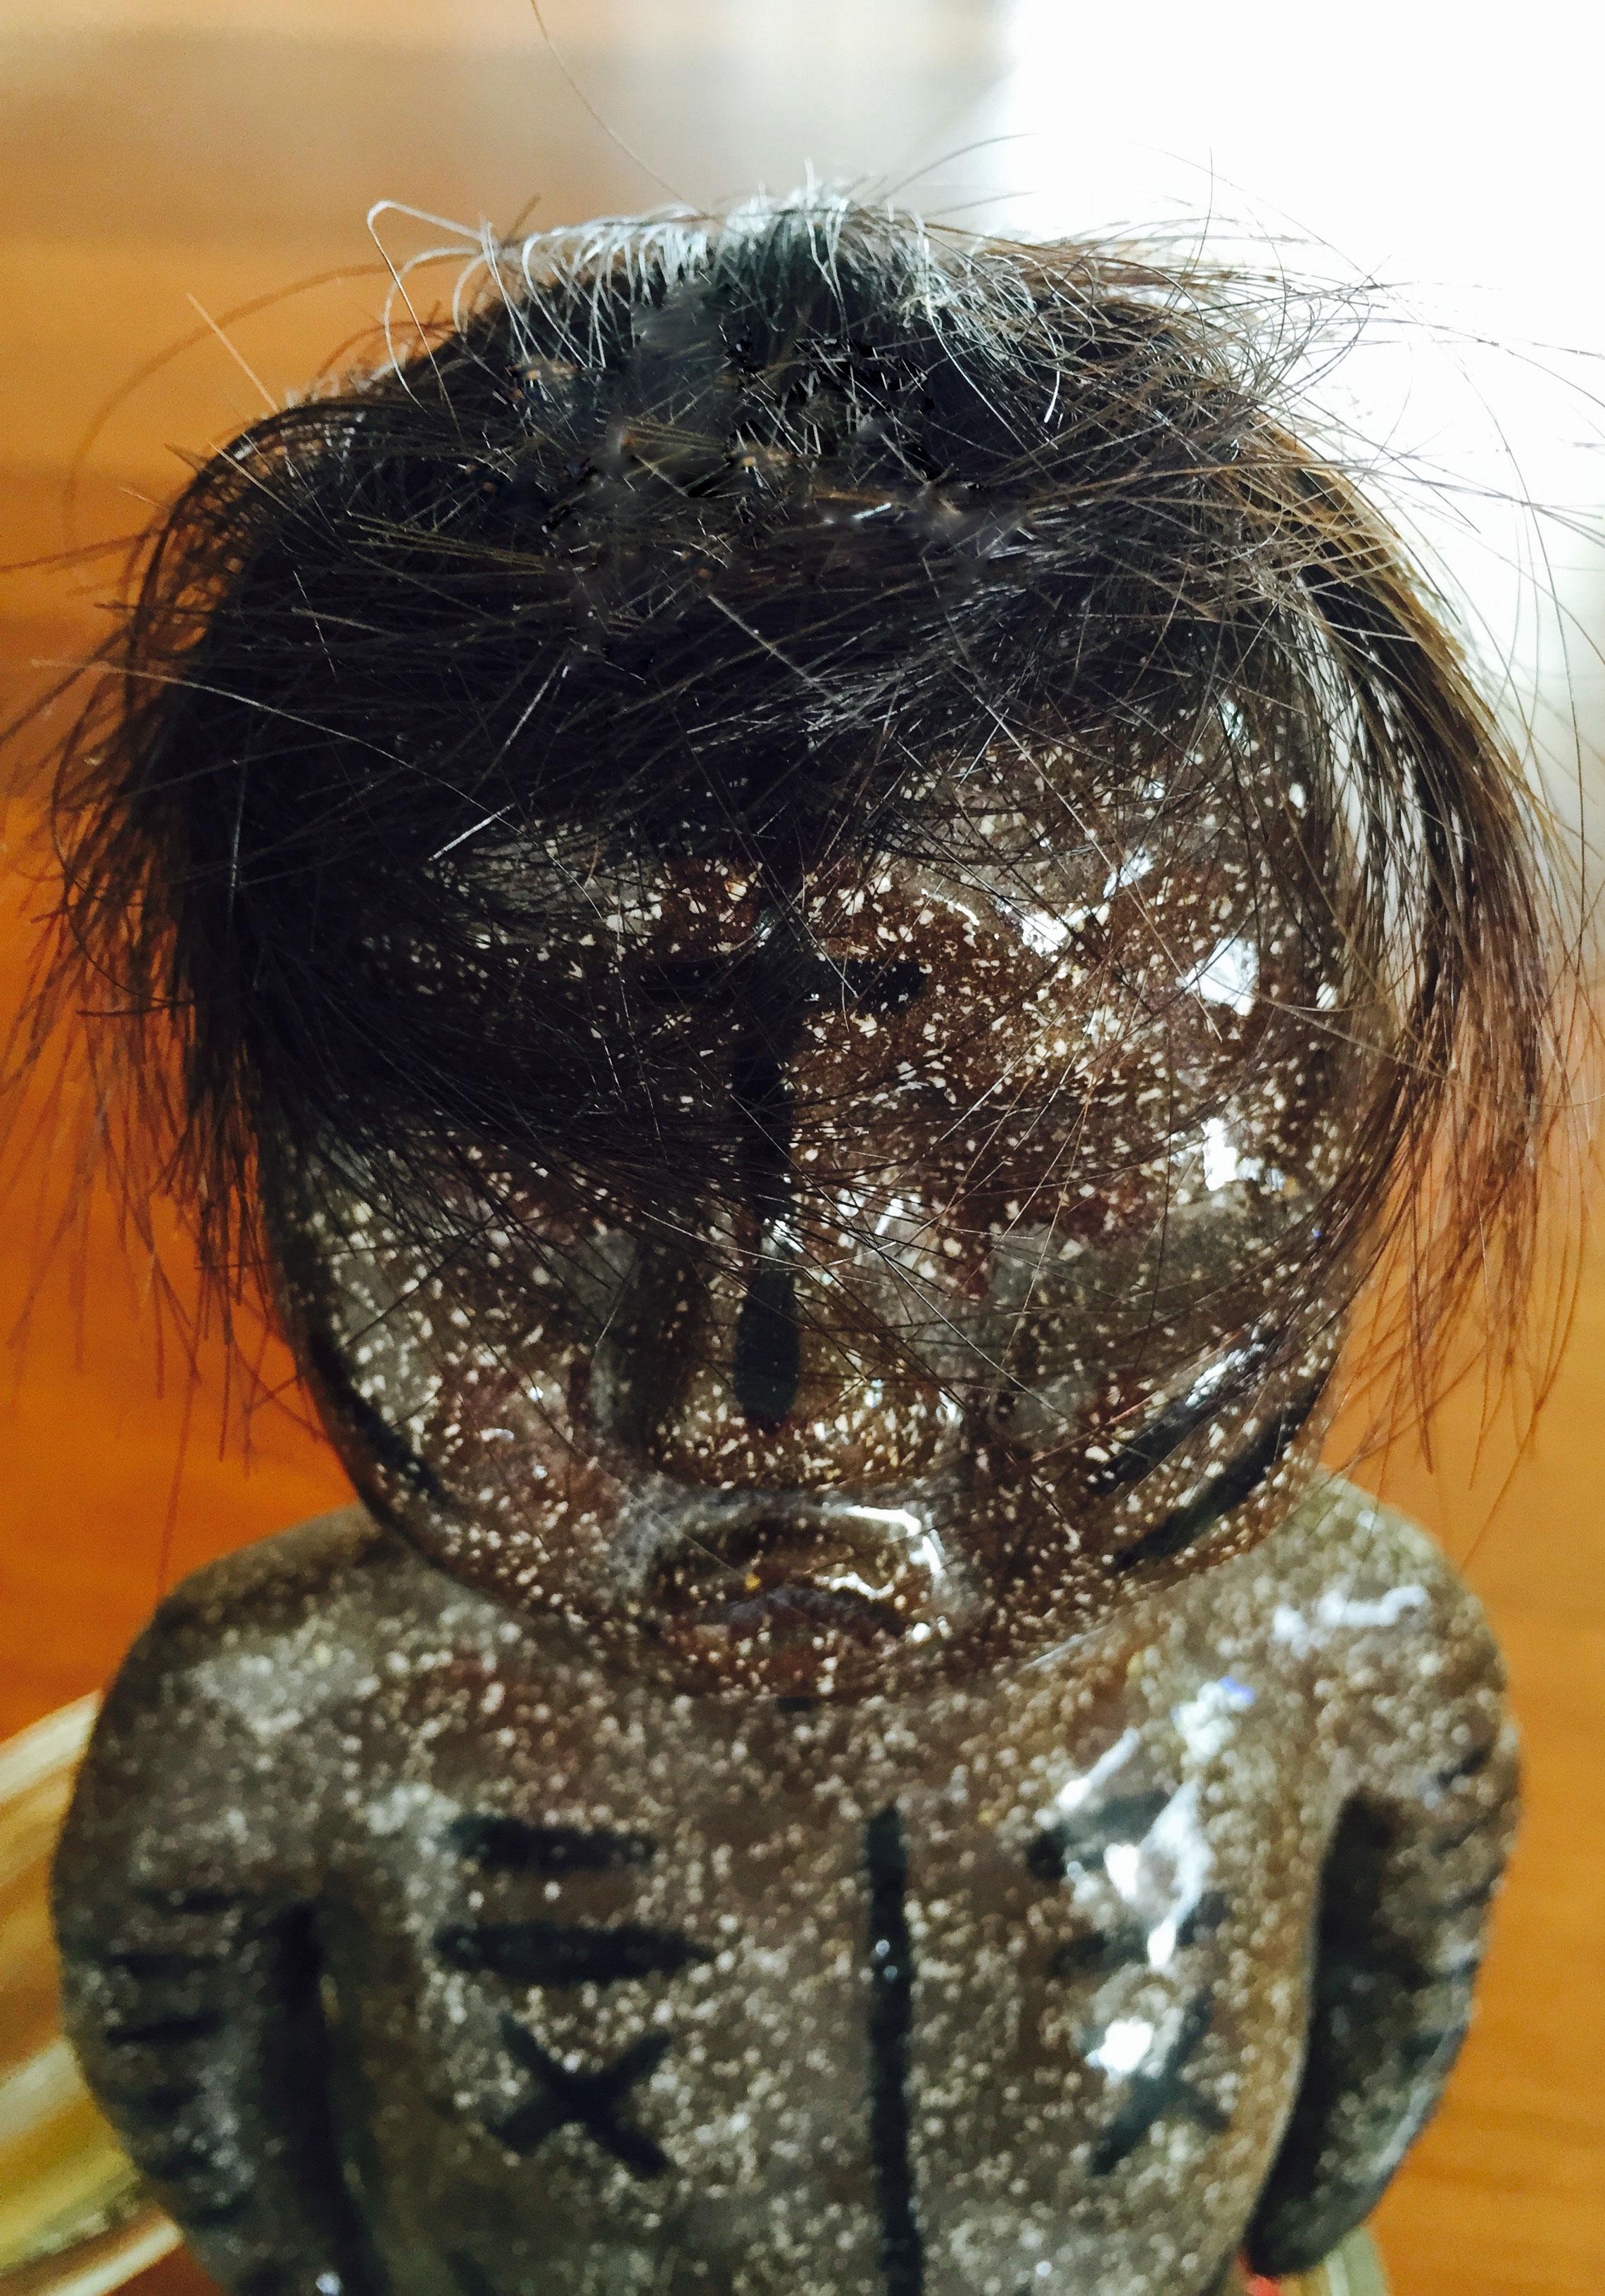 Untitled Ceramic, Human Hair Dimension Variable 2014